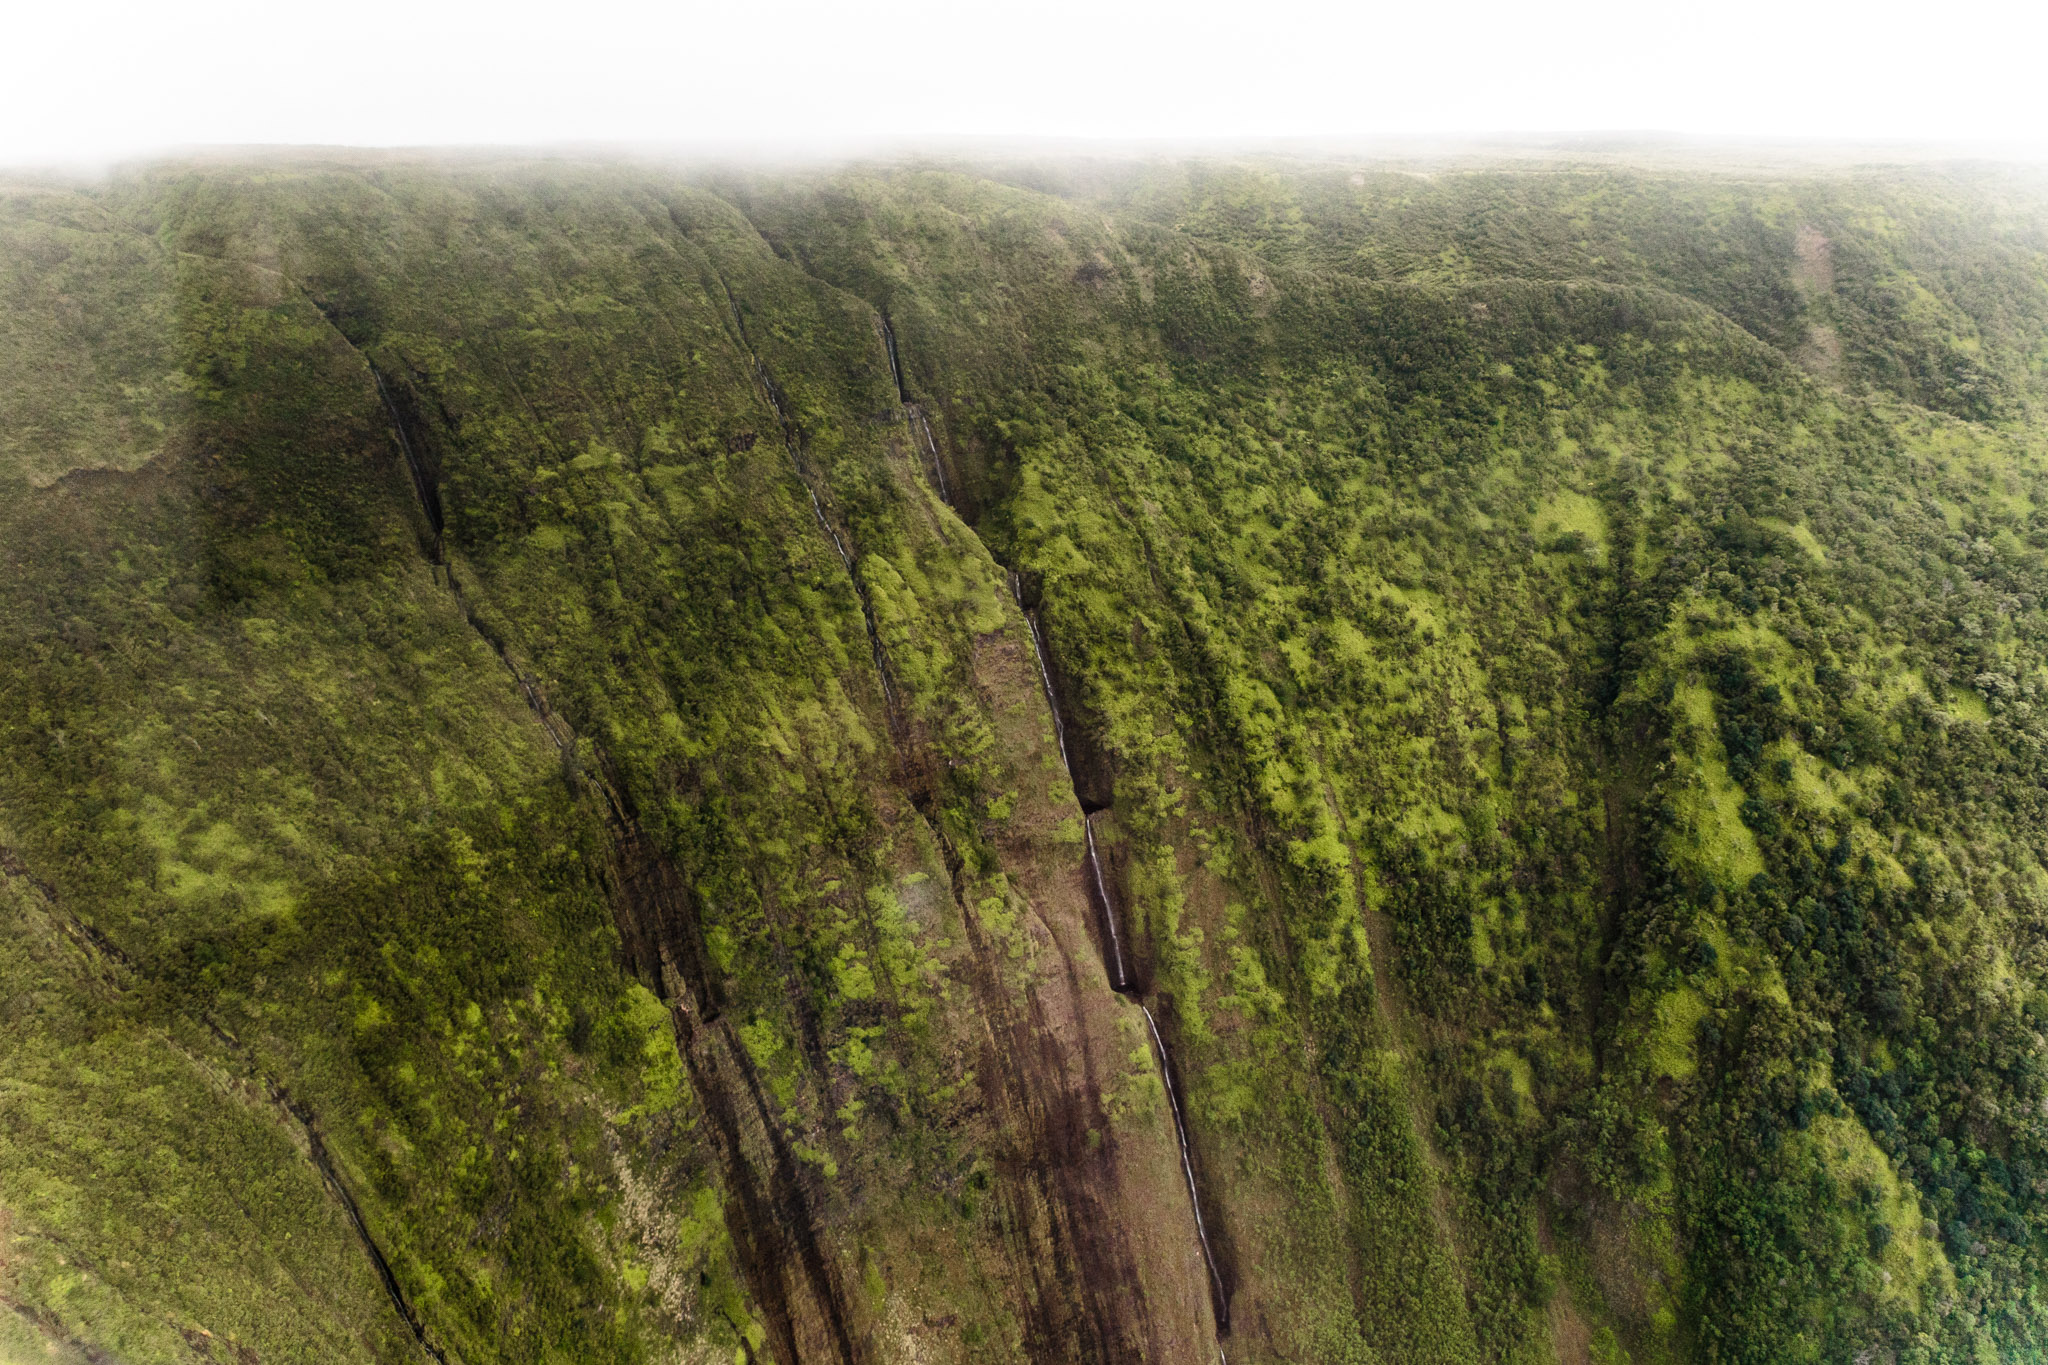 Helicopter flight over waterfalls on the Big Island  // 10 Things You Have to Do on the Big Island of Hawaii // www.readysetjetset.net #readysetjetset #hawaii #bigisland #blogpost #hawaiiguide